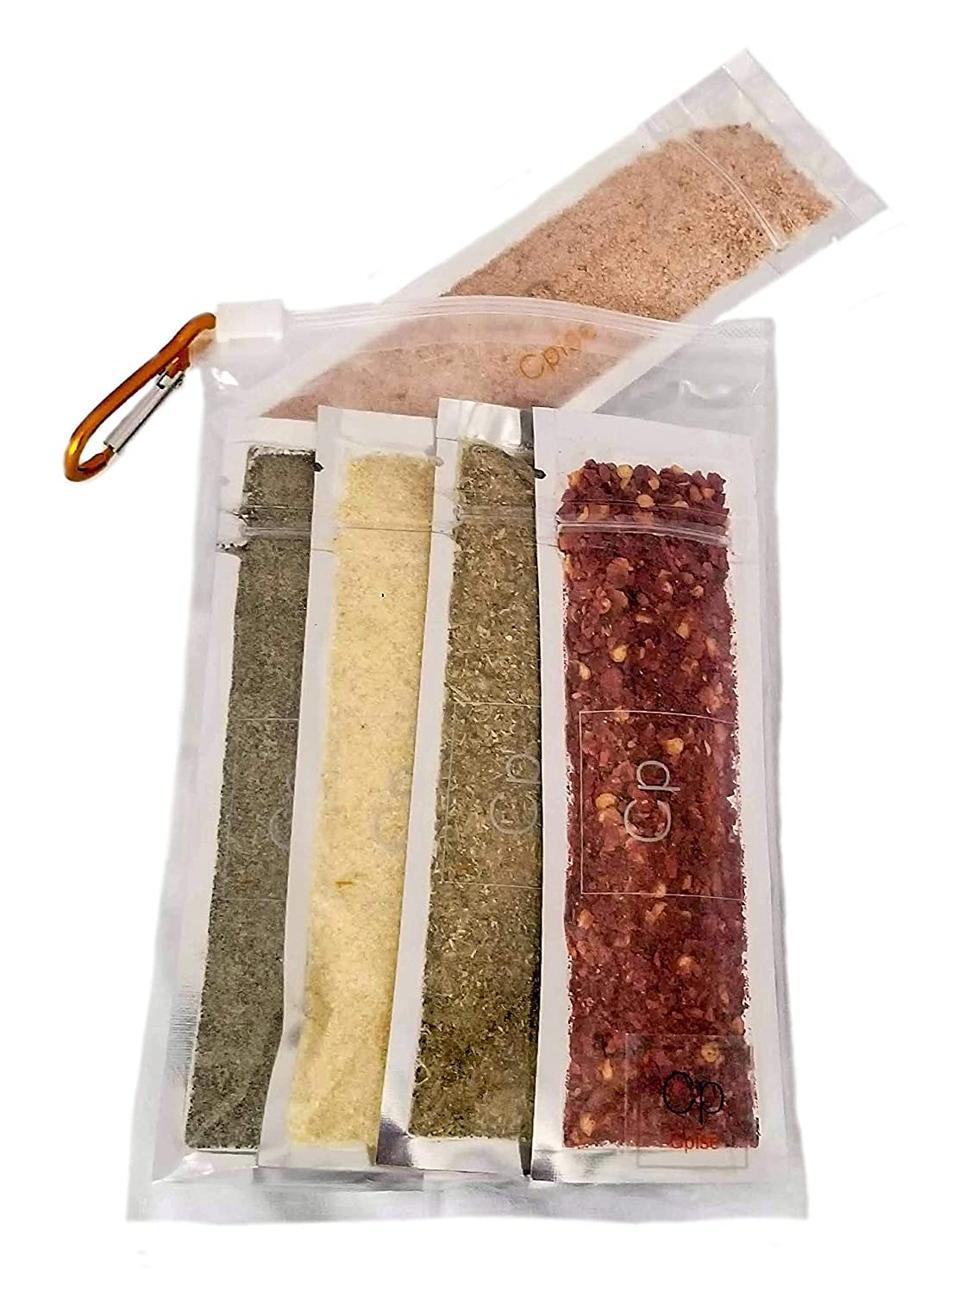 CSpice Organic Camping Spice Set